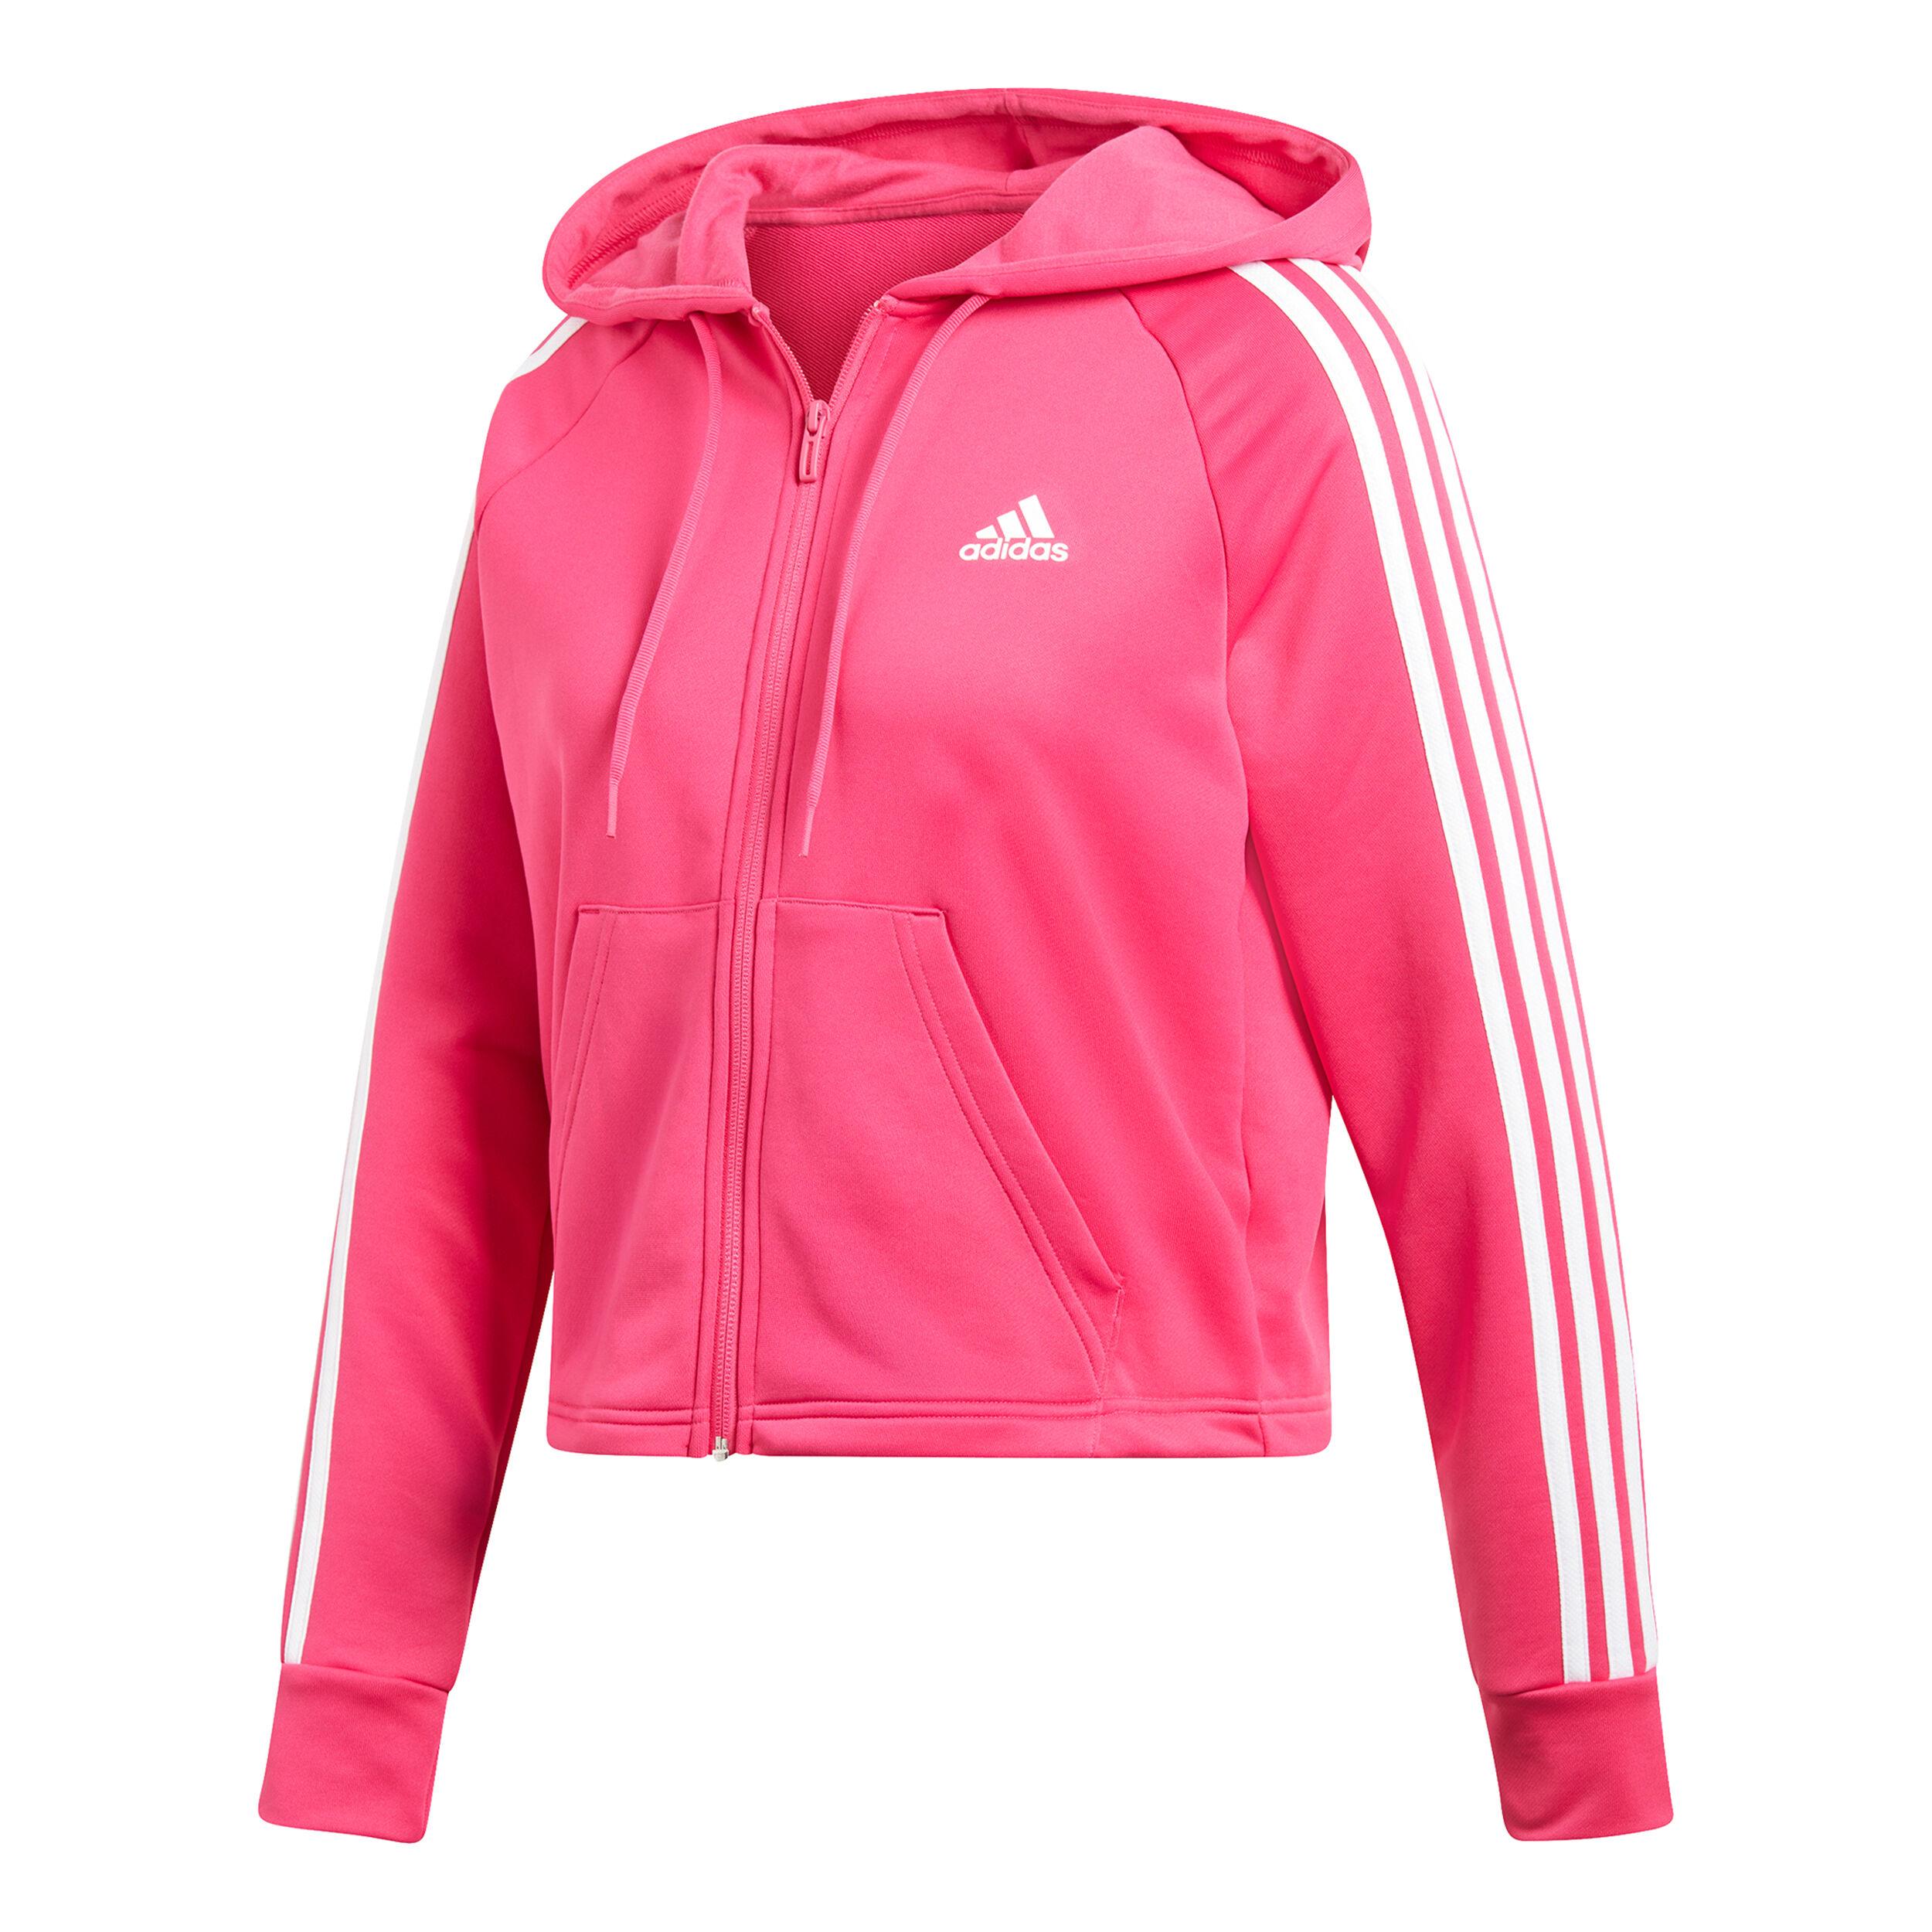 trainingsanzug adidas damen pink